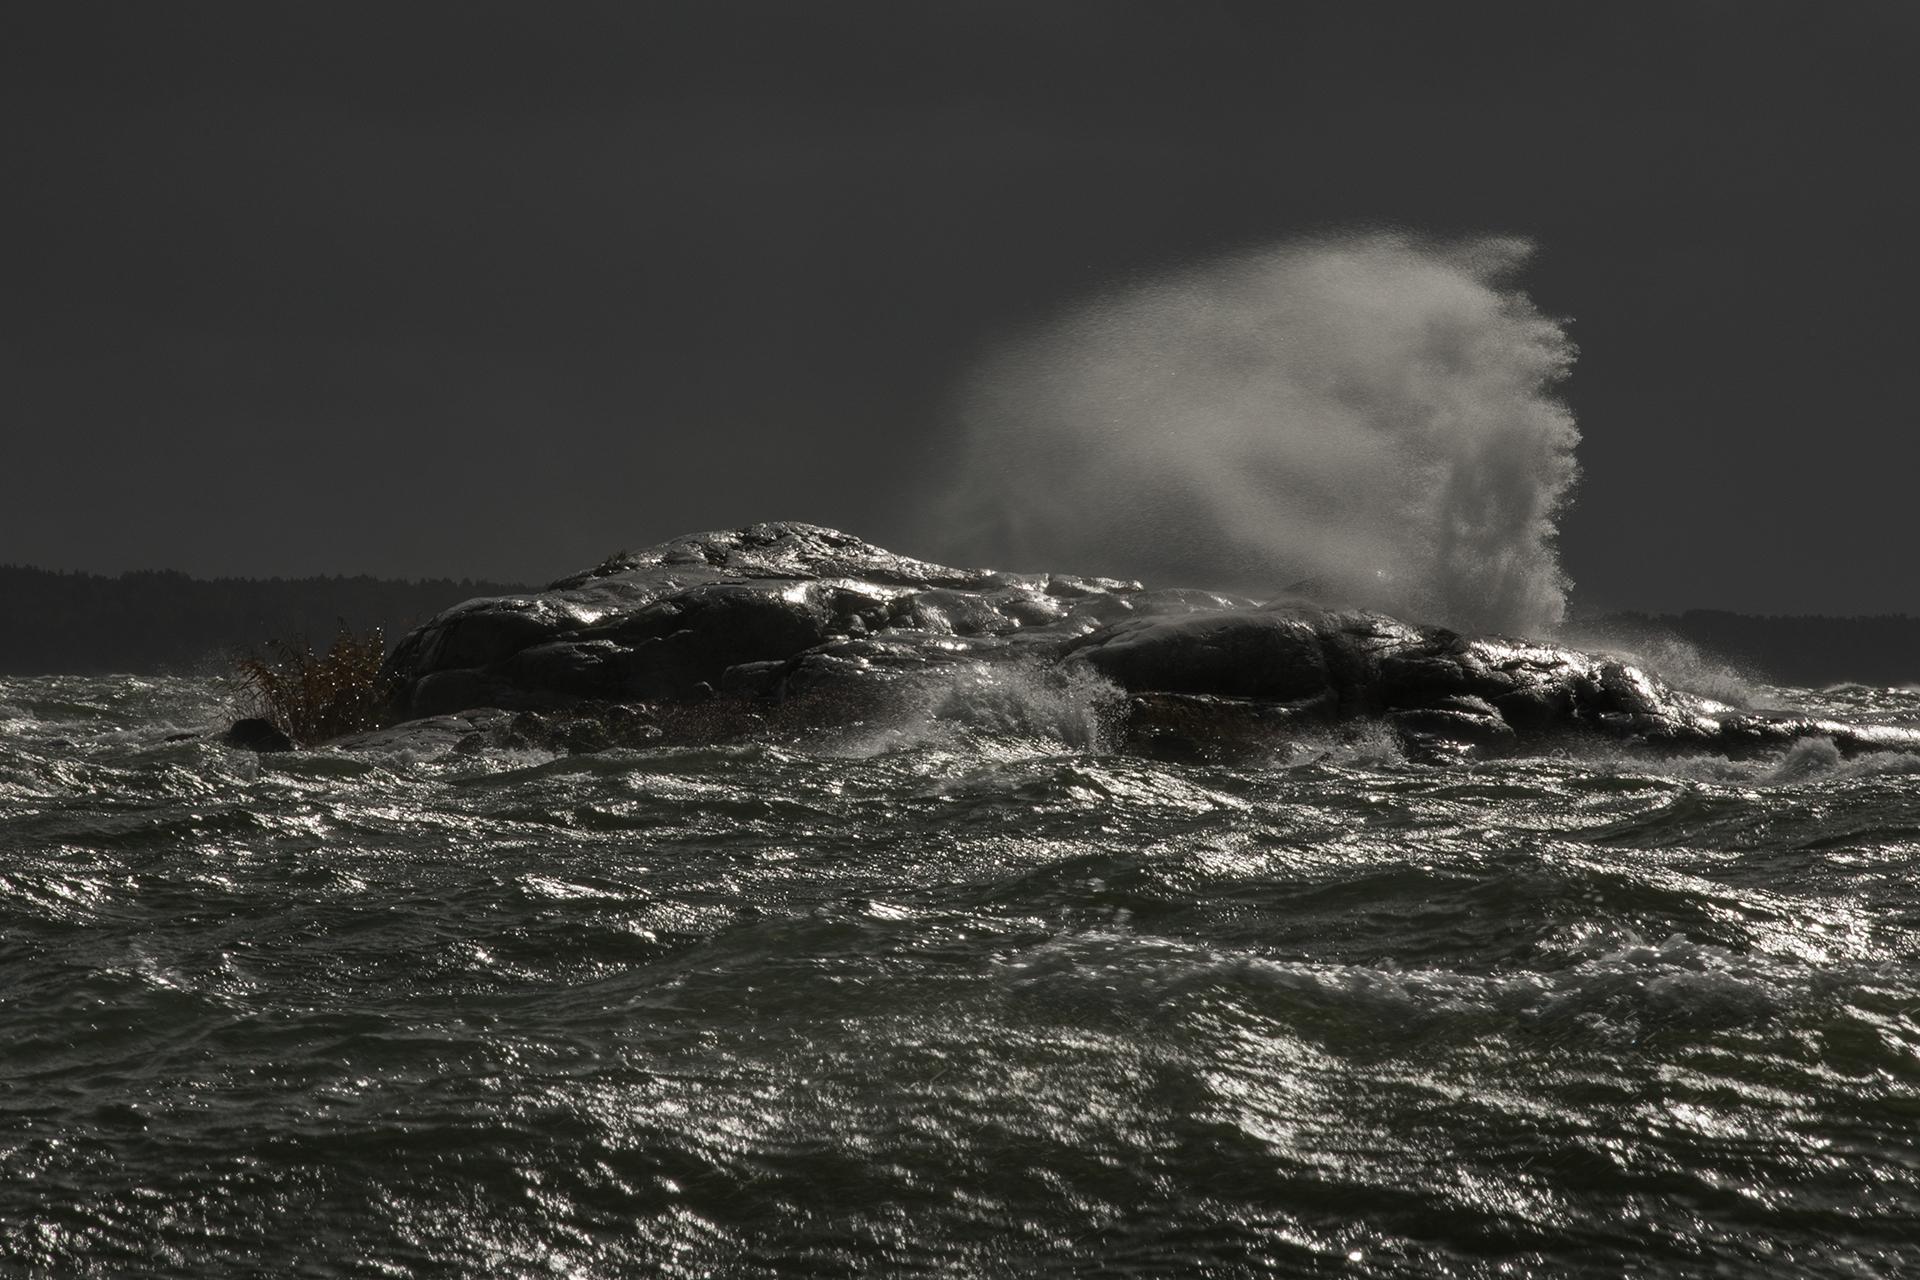 An autumn storm / Photo: A. Kuusela